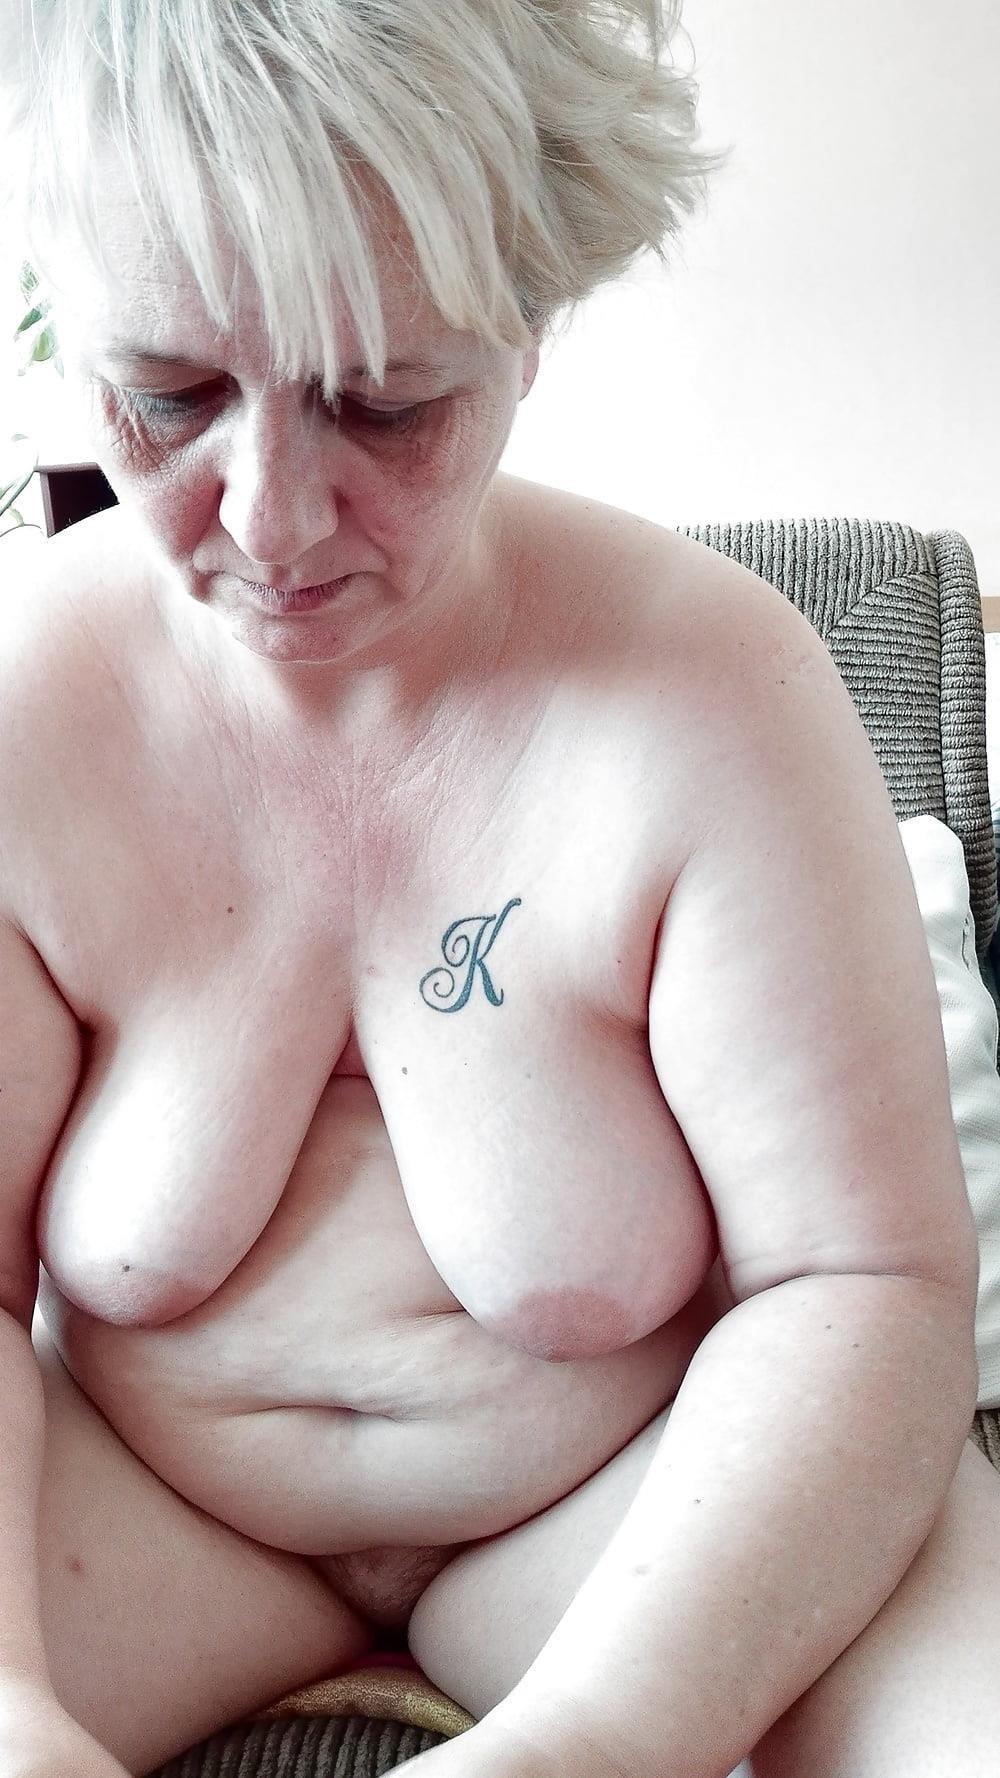 Big tits creampie pics-6594